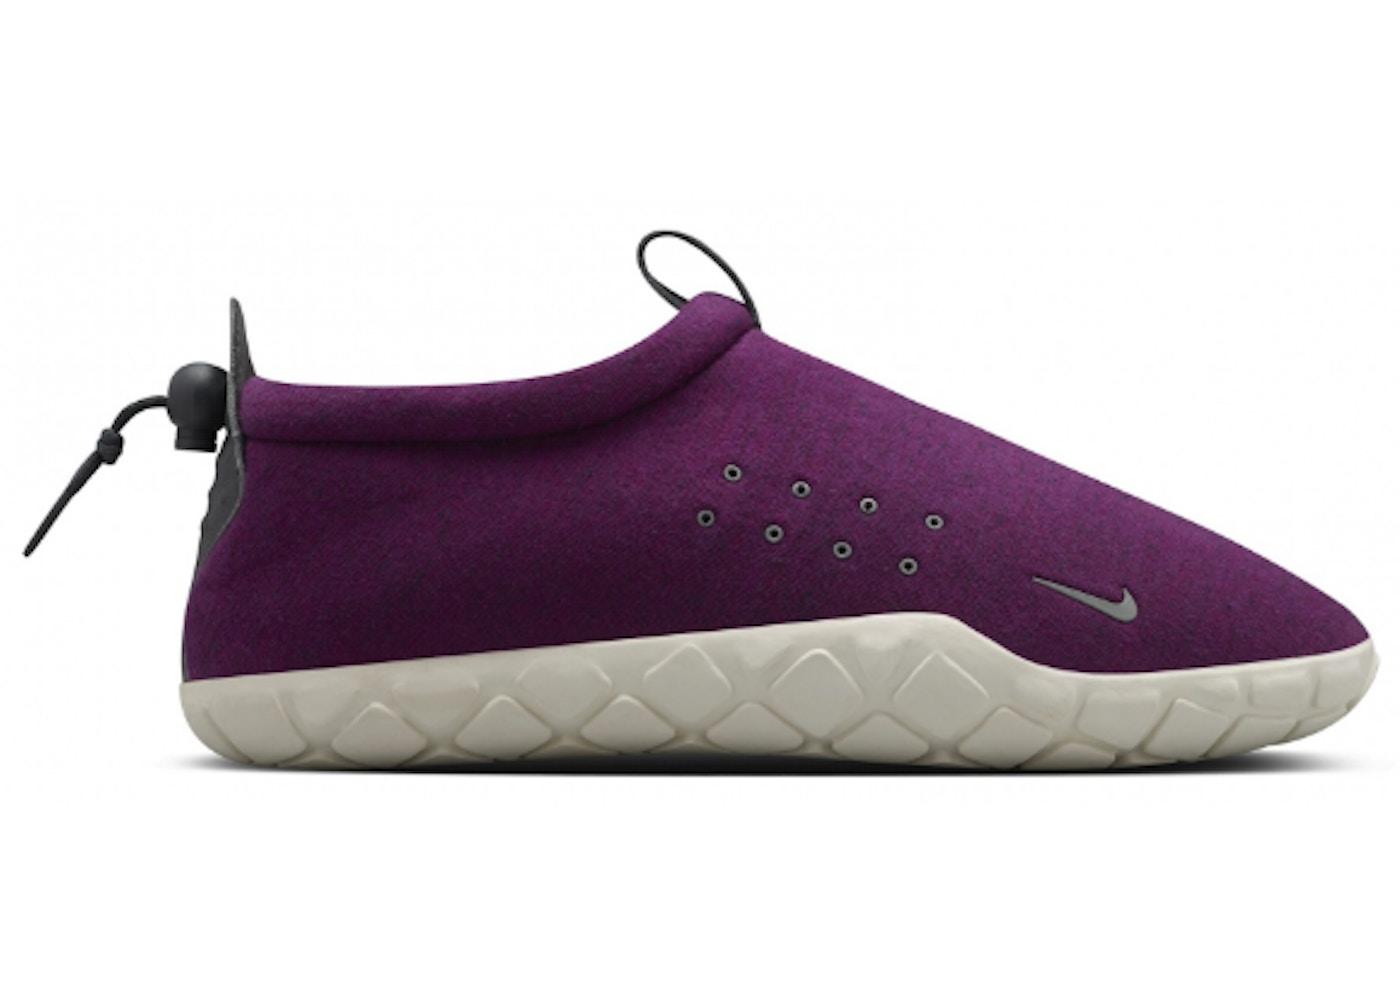 sale retailer 219bd b9852 Nike Air Moc Tech Fleece Mulberry - 834591 510